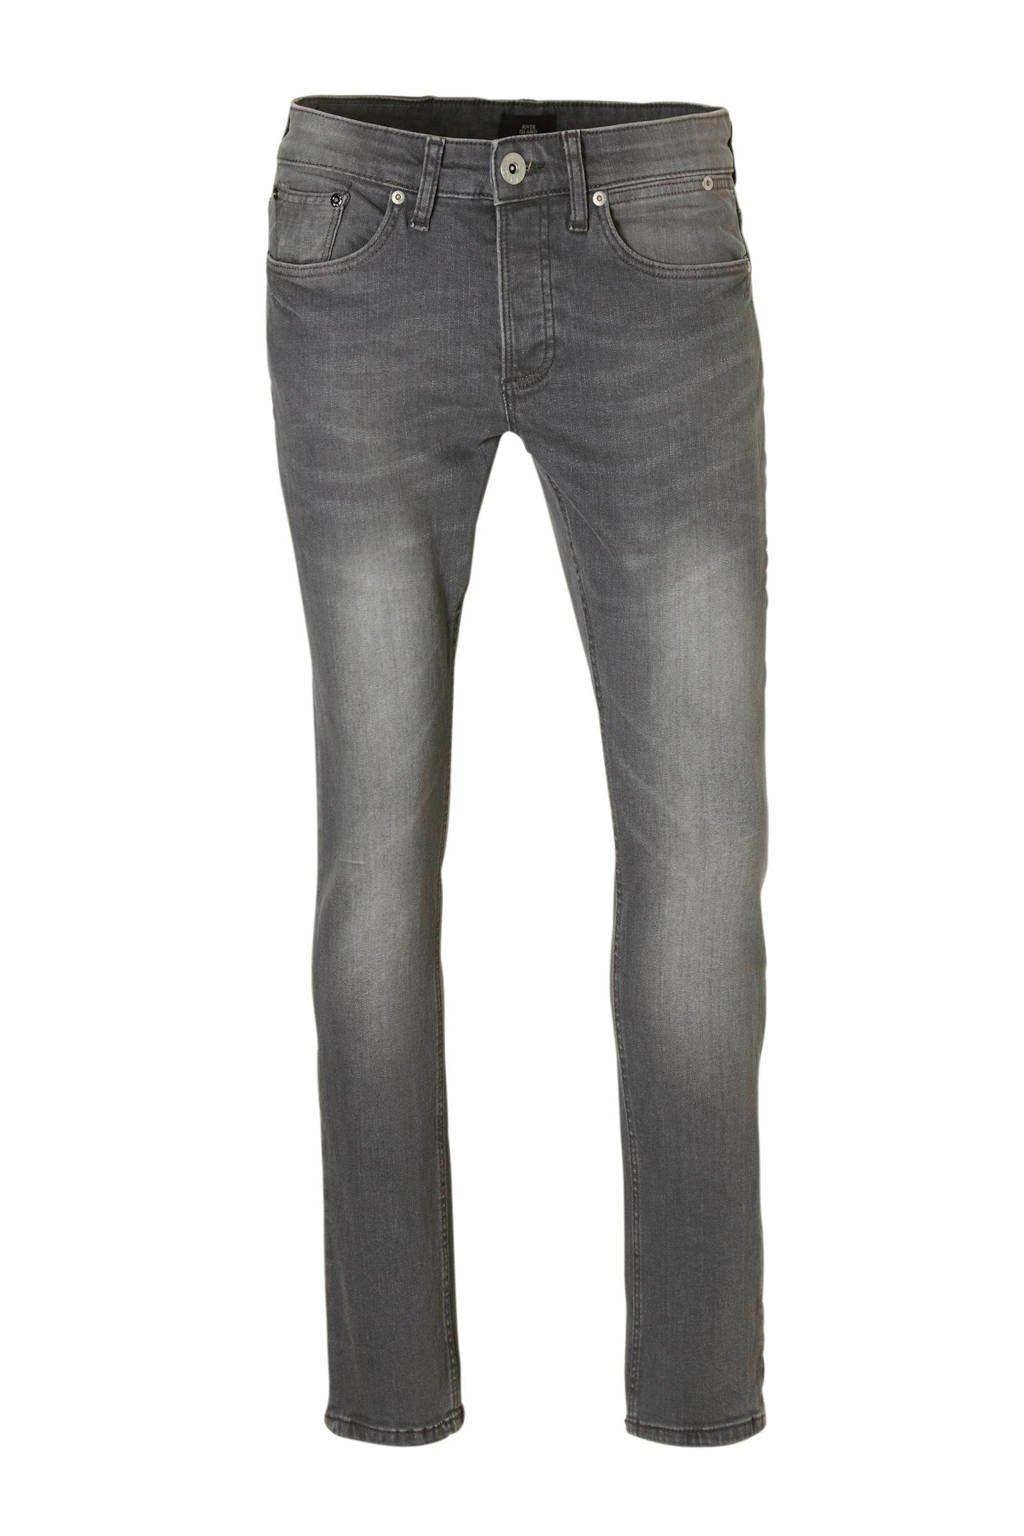 River Island skinny fit jeans grijs, Grijs